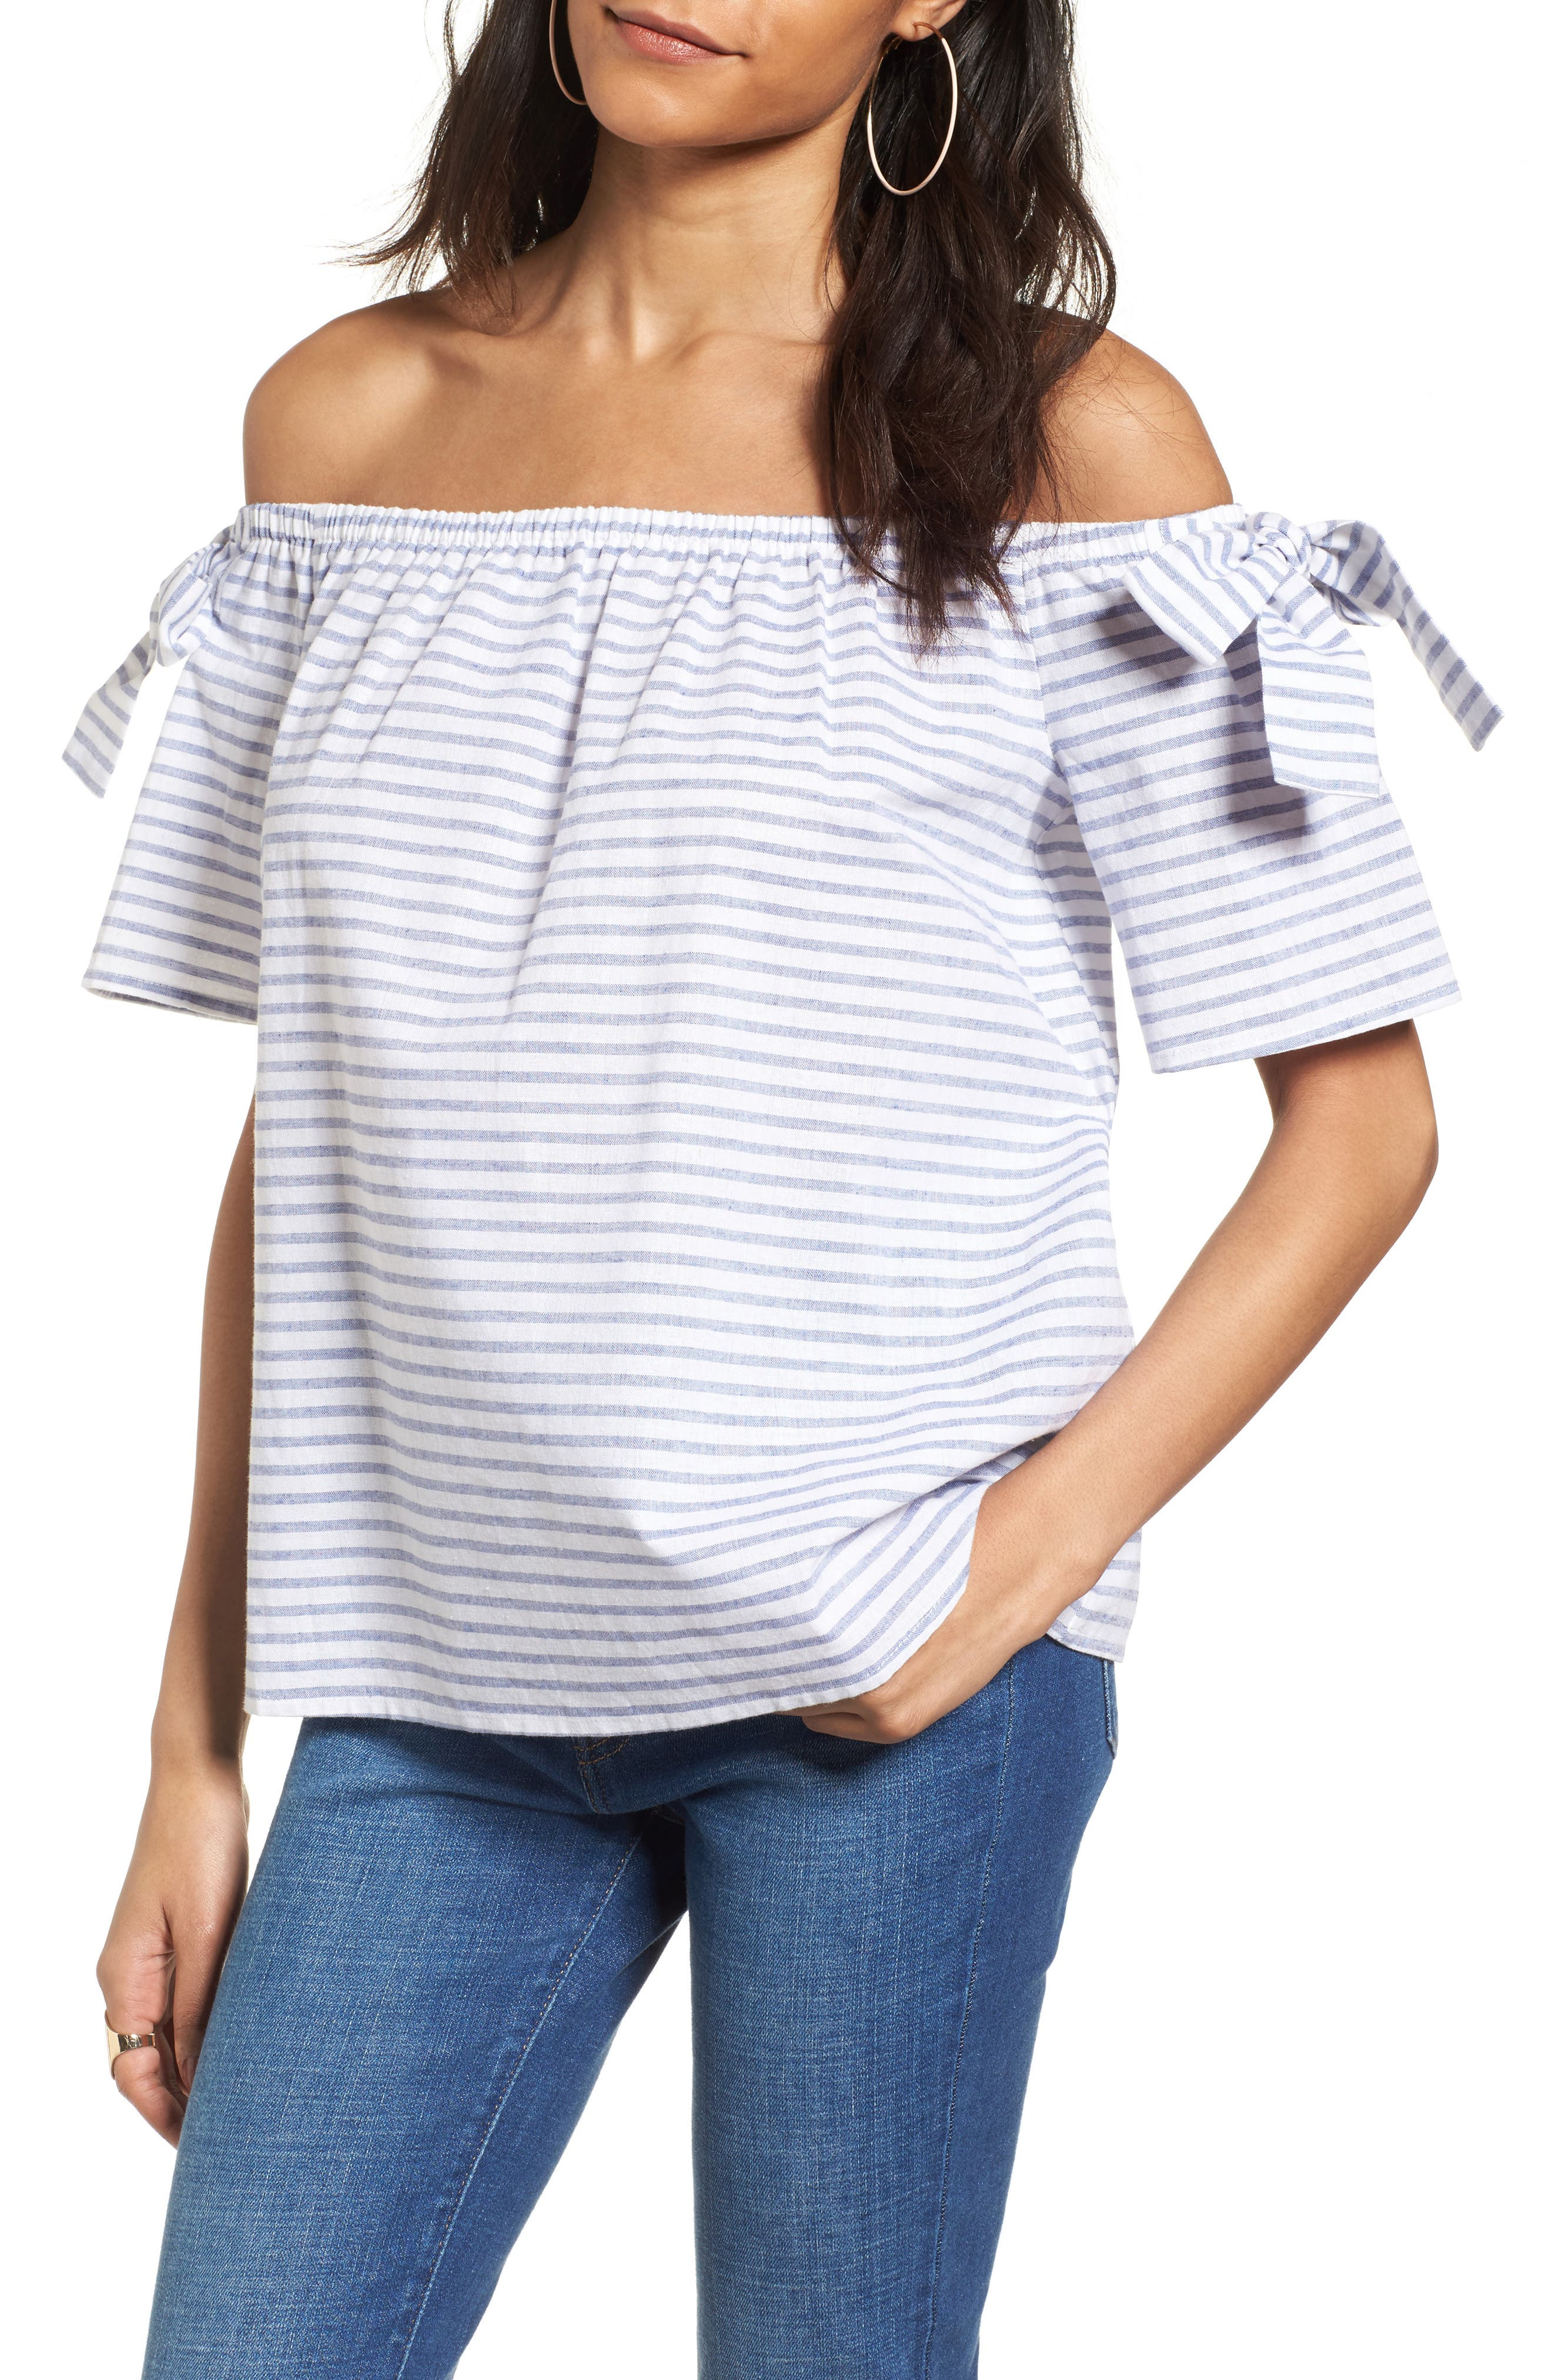 Alternate Image 1 Selected - Soprano Stripe Cotton & Linen Off the Shoulder Top